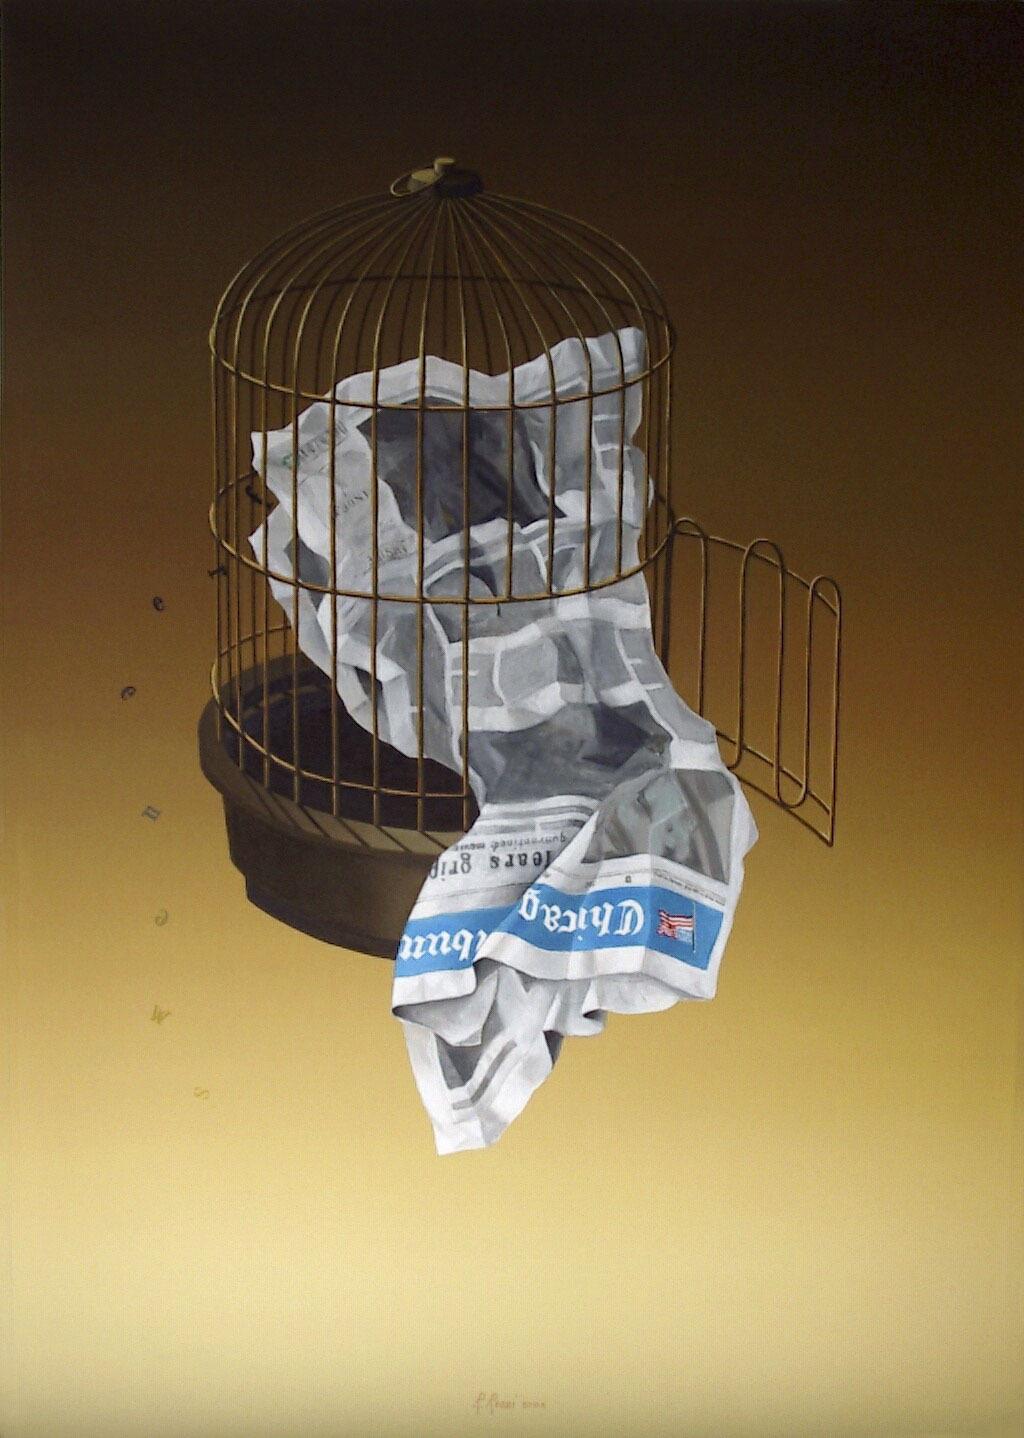 2004 roberta rossi – Free news – olio su tela – 100 x 70